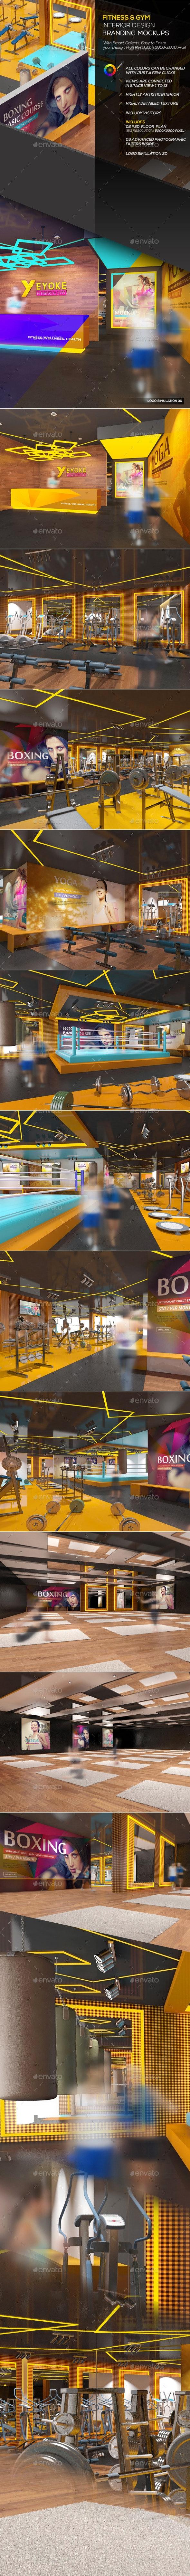 Fitness & Gym Interior Design  Branding Mockups - Logo Product Mock-Ups